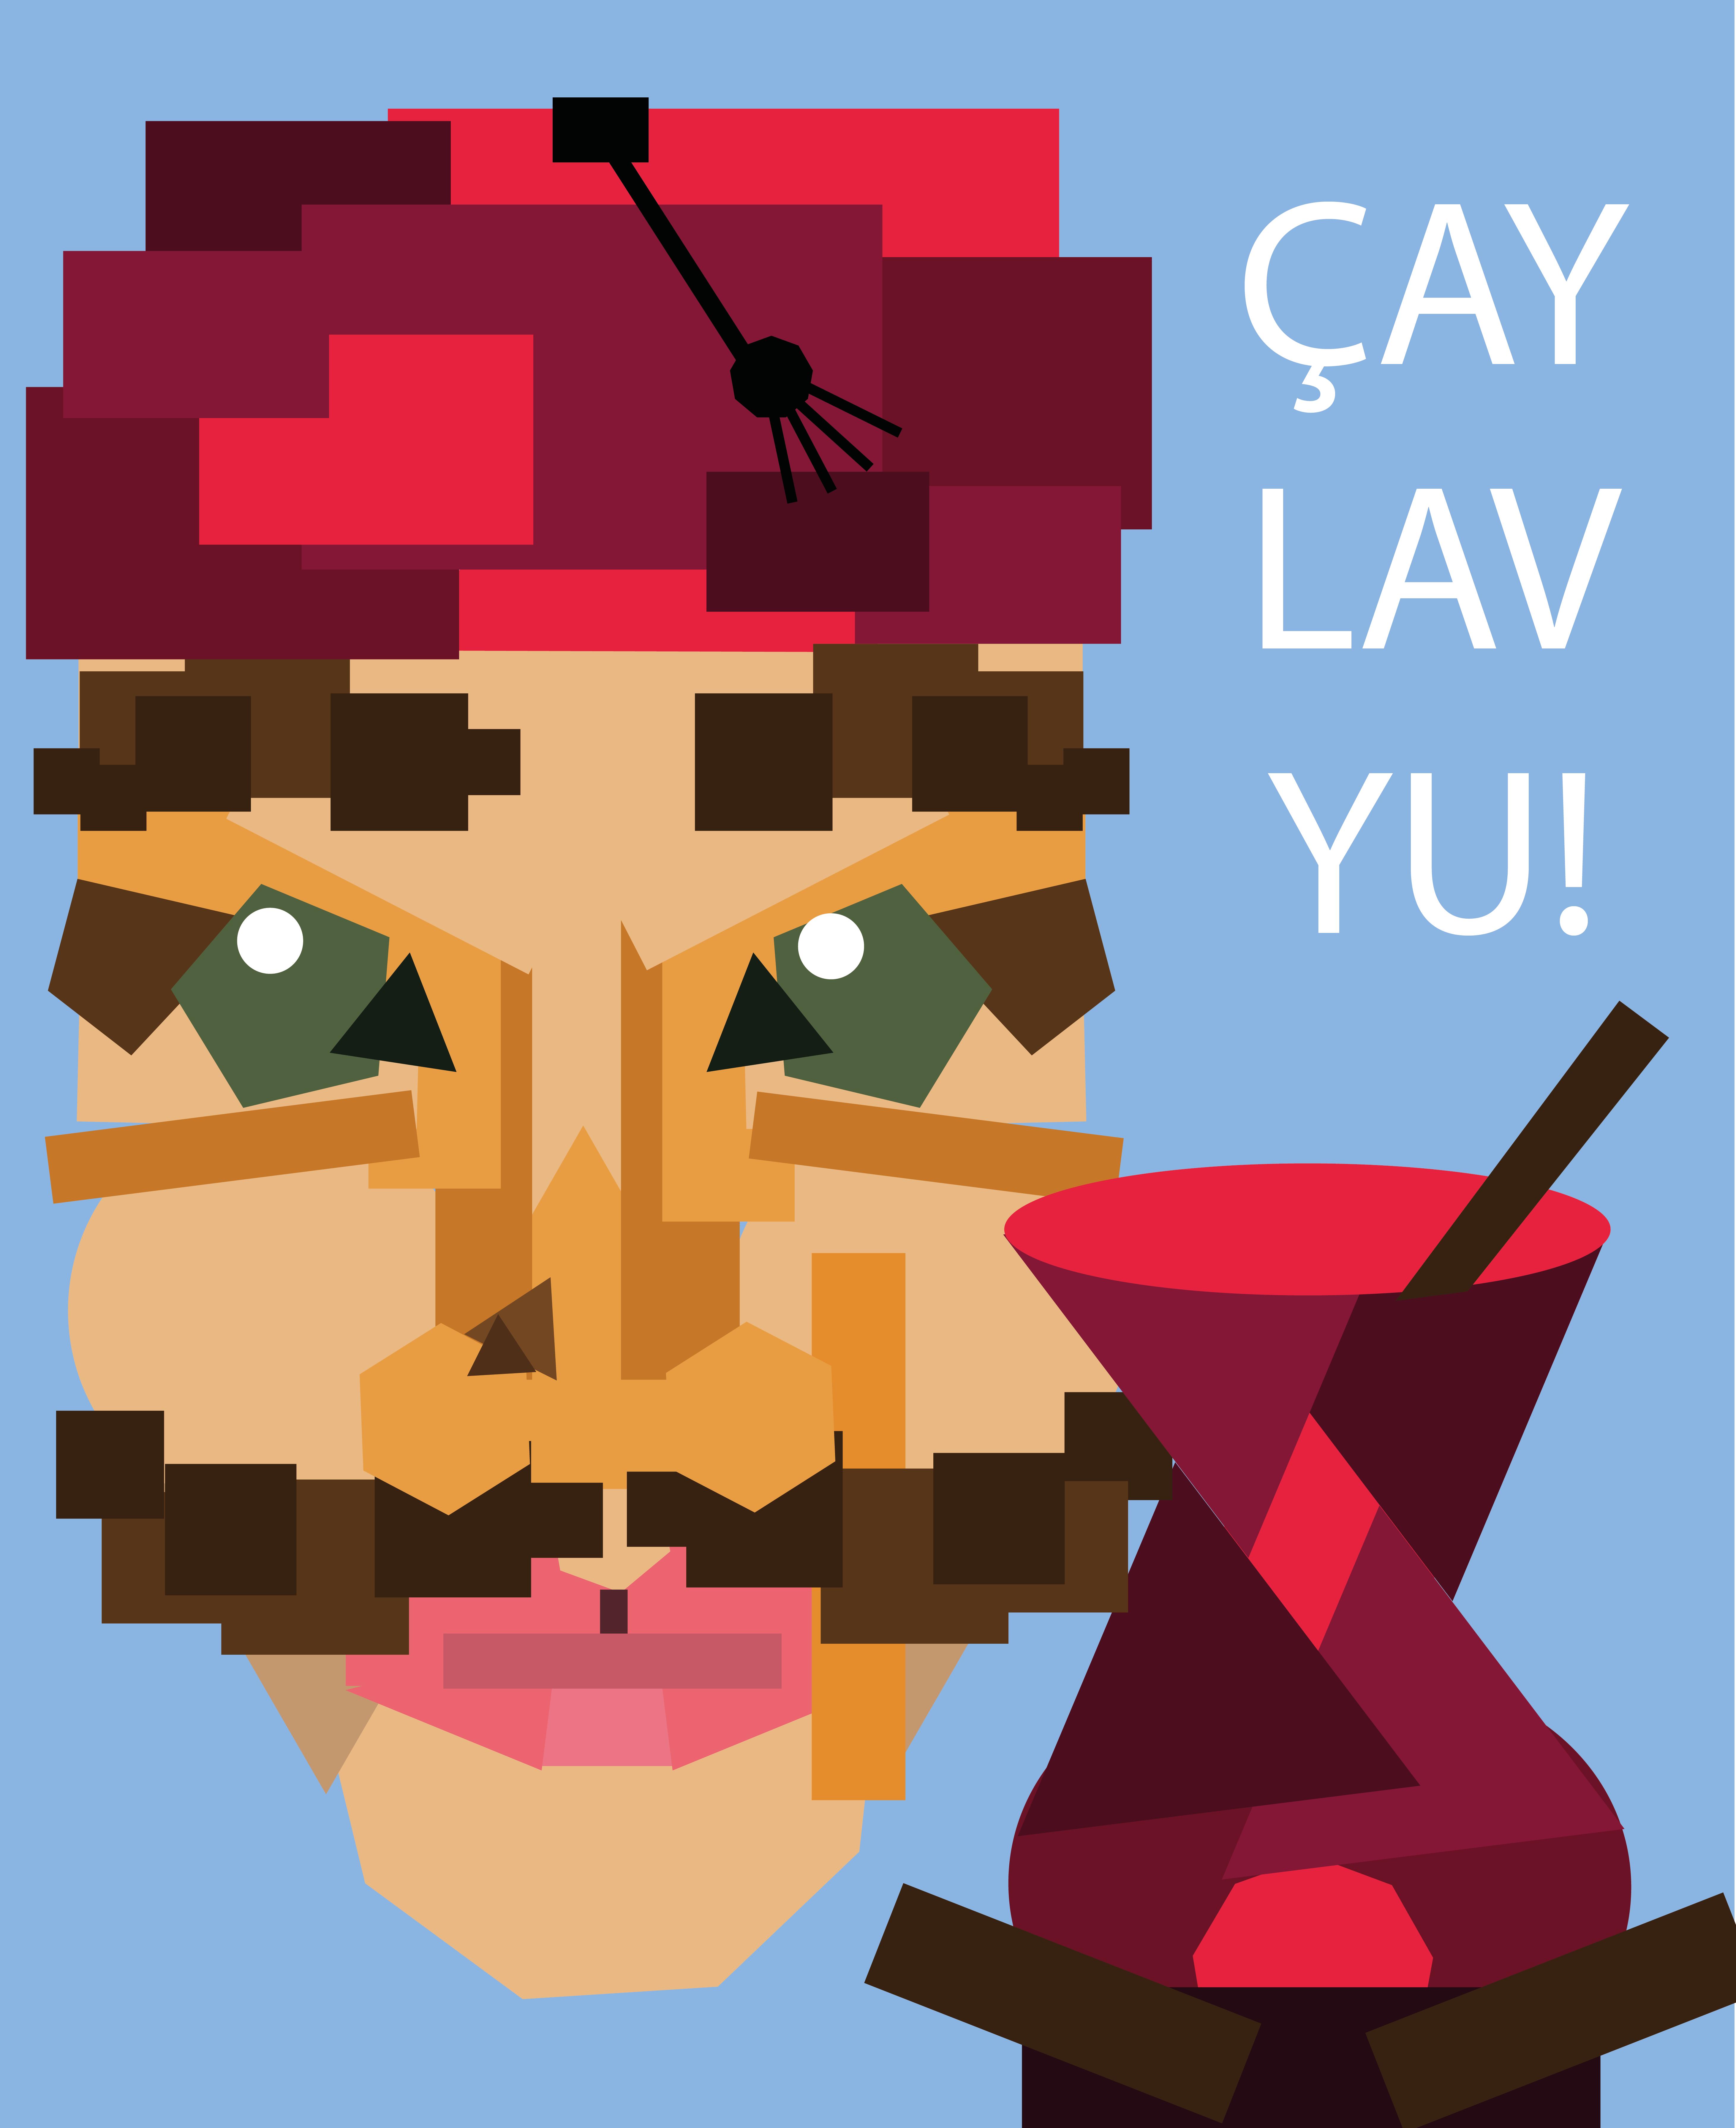 CAY LAV YU